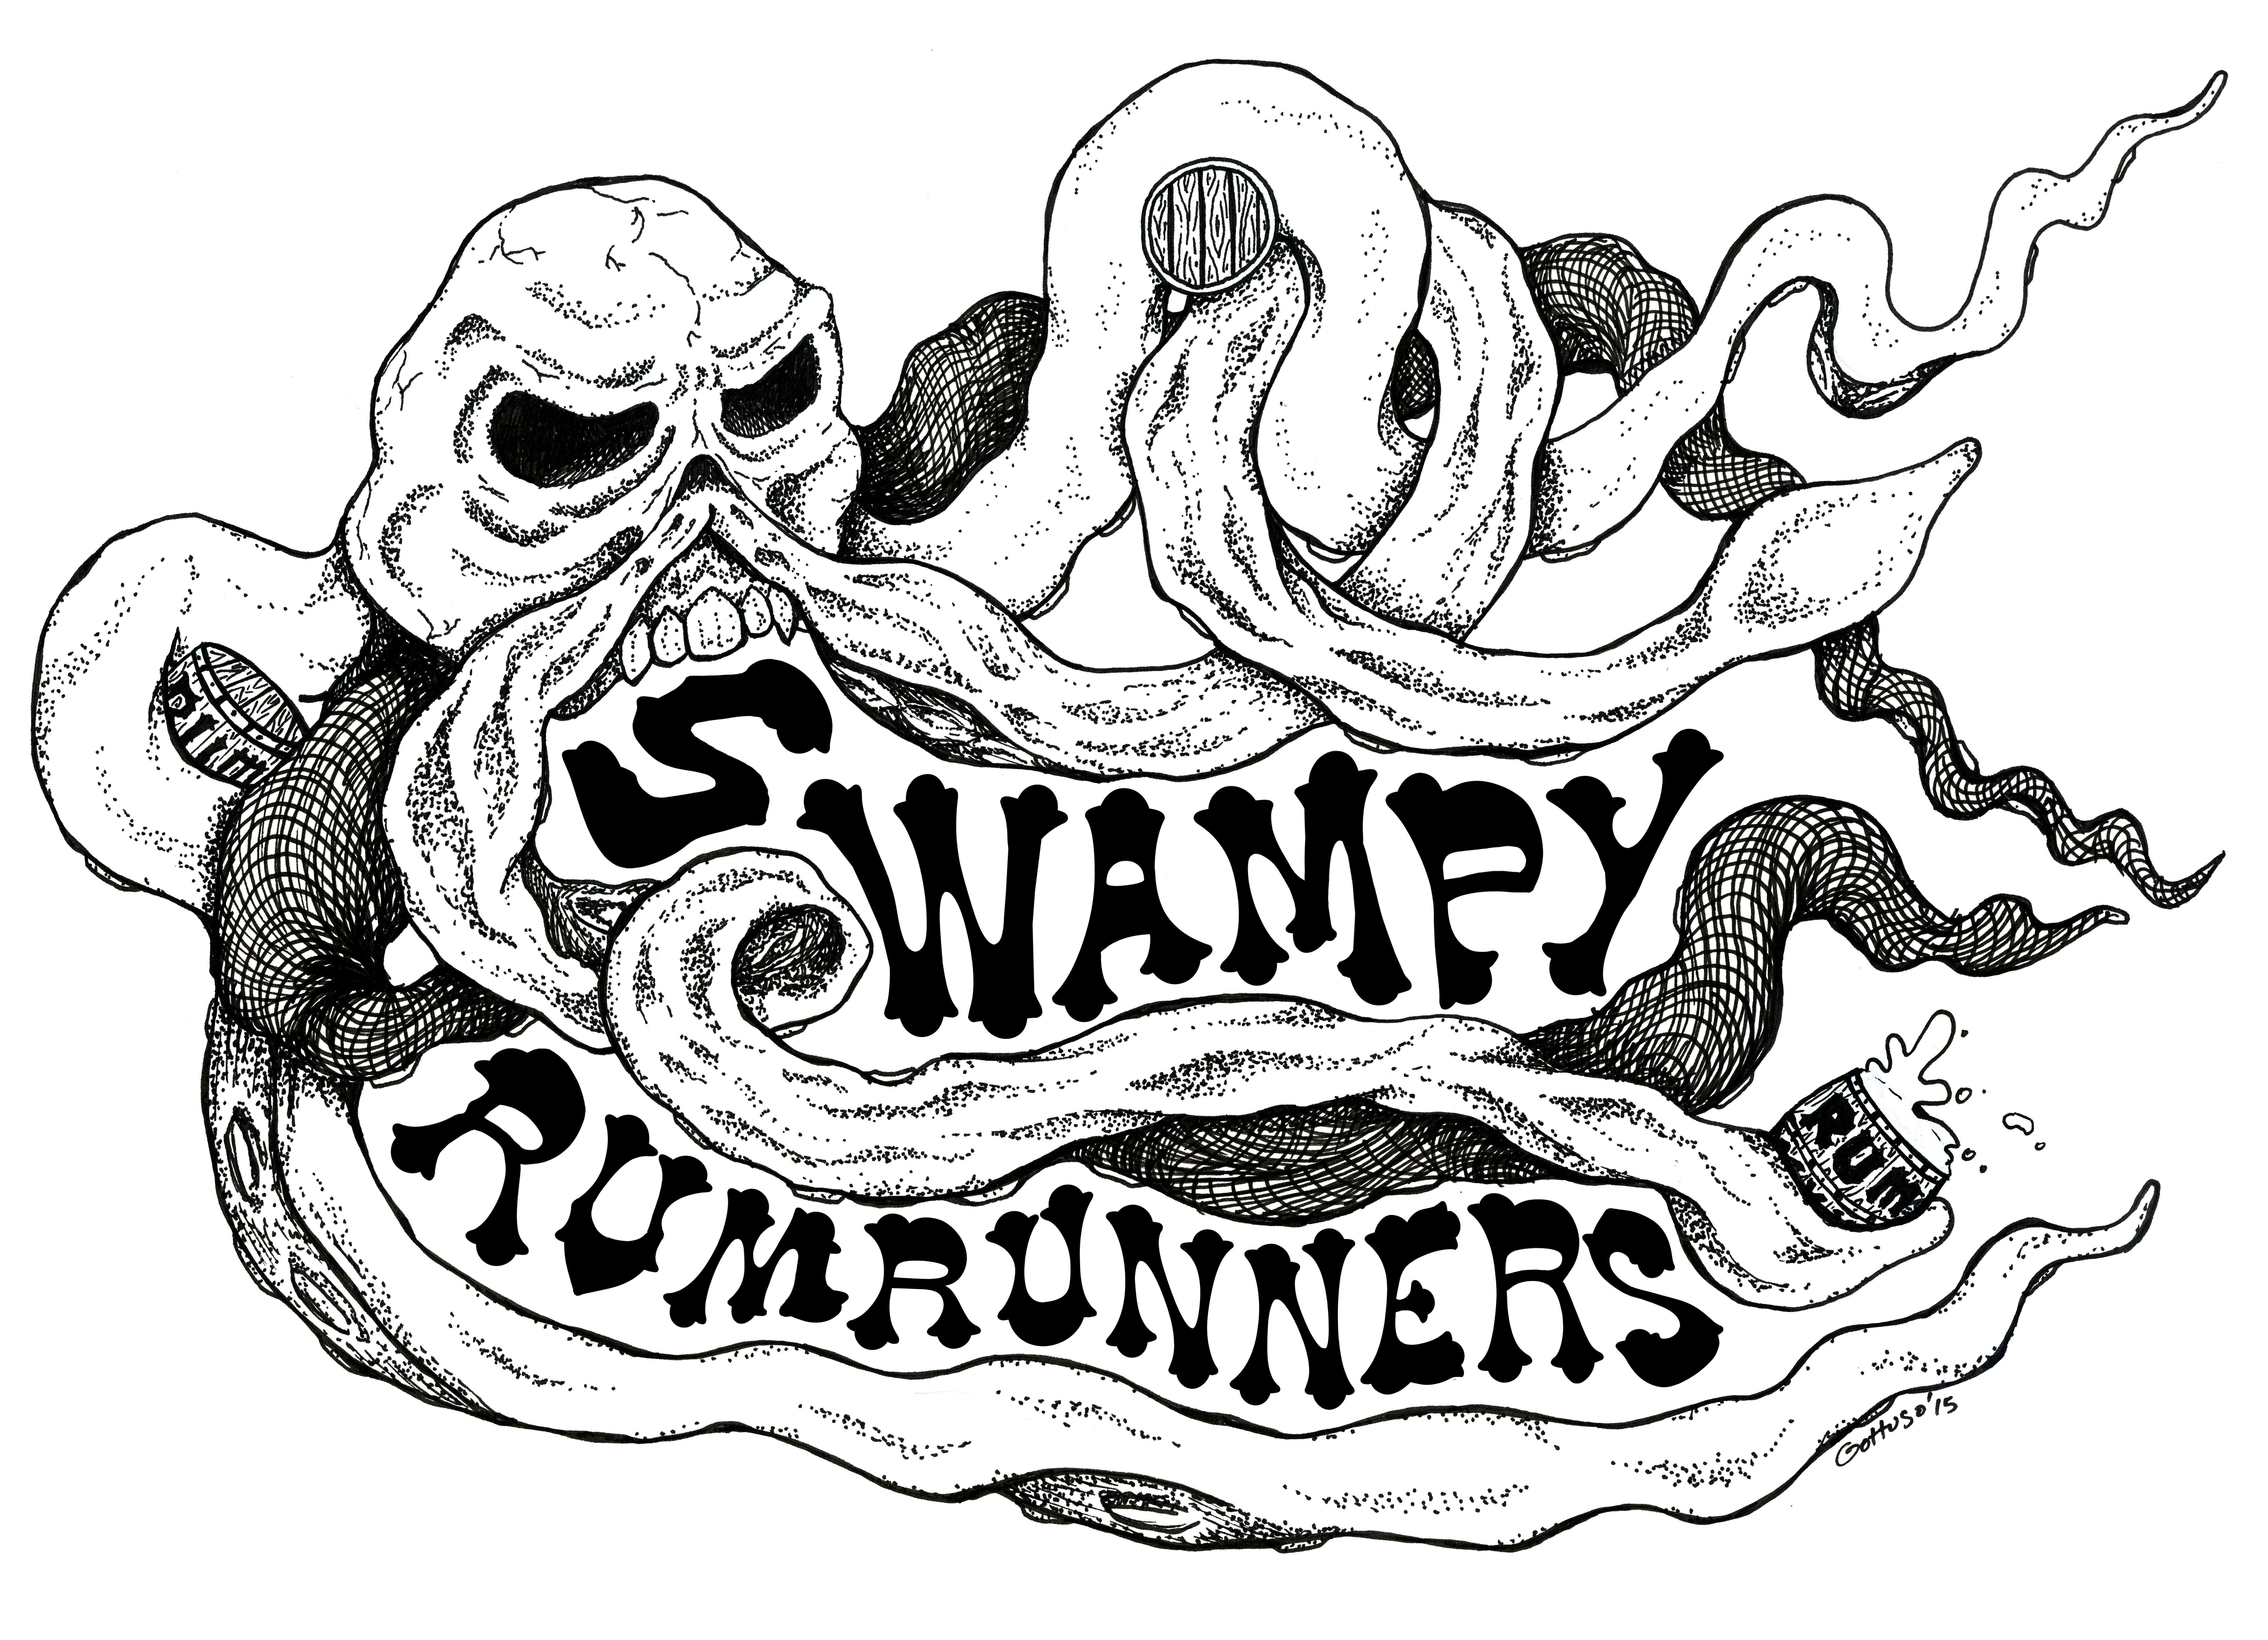 swampy rum runners006b